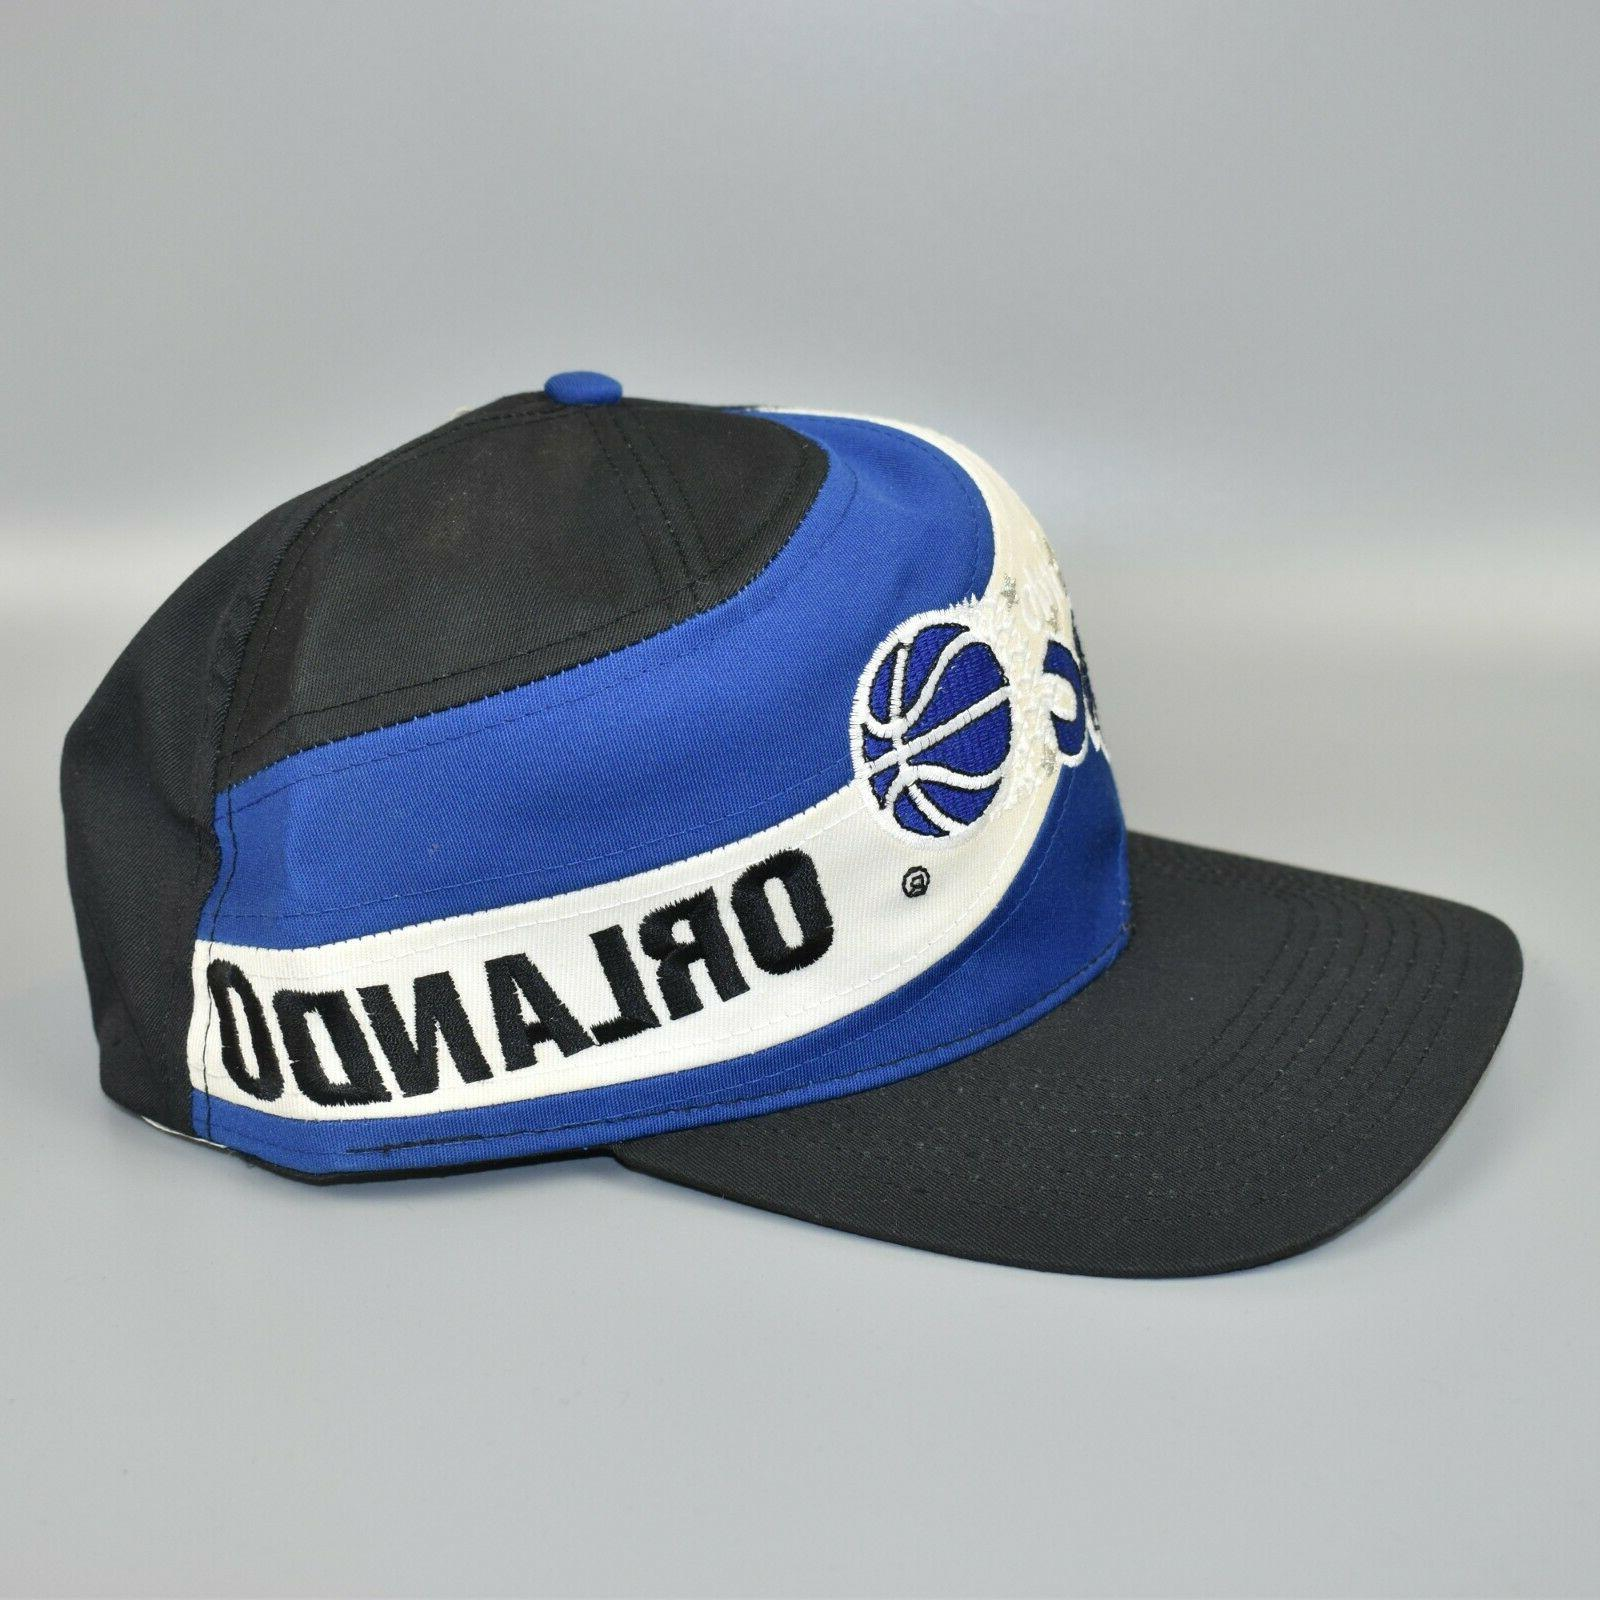 Orlando Magic NBA Twins Enterprise Vintage 90's